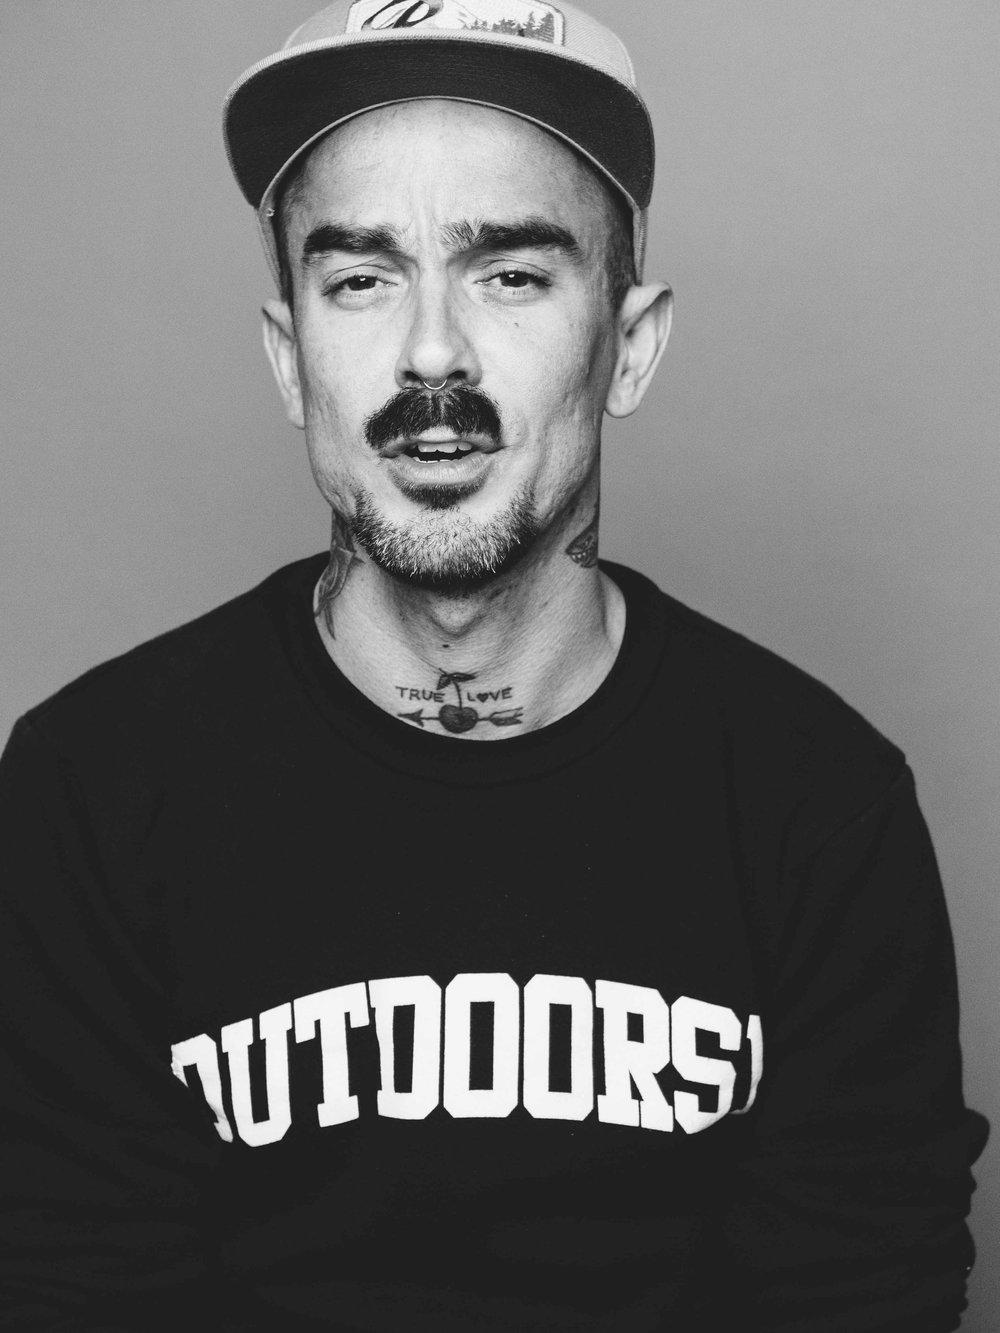 2017_11_14_Portraits_Brandon_Roberts_009.JPG